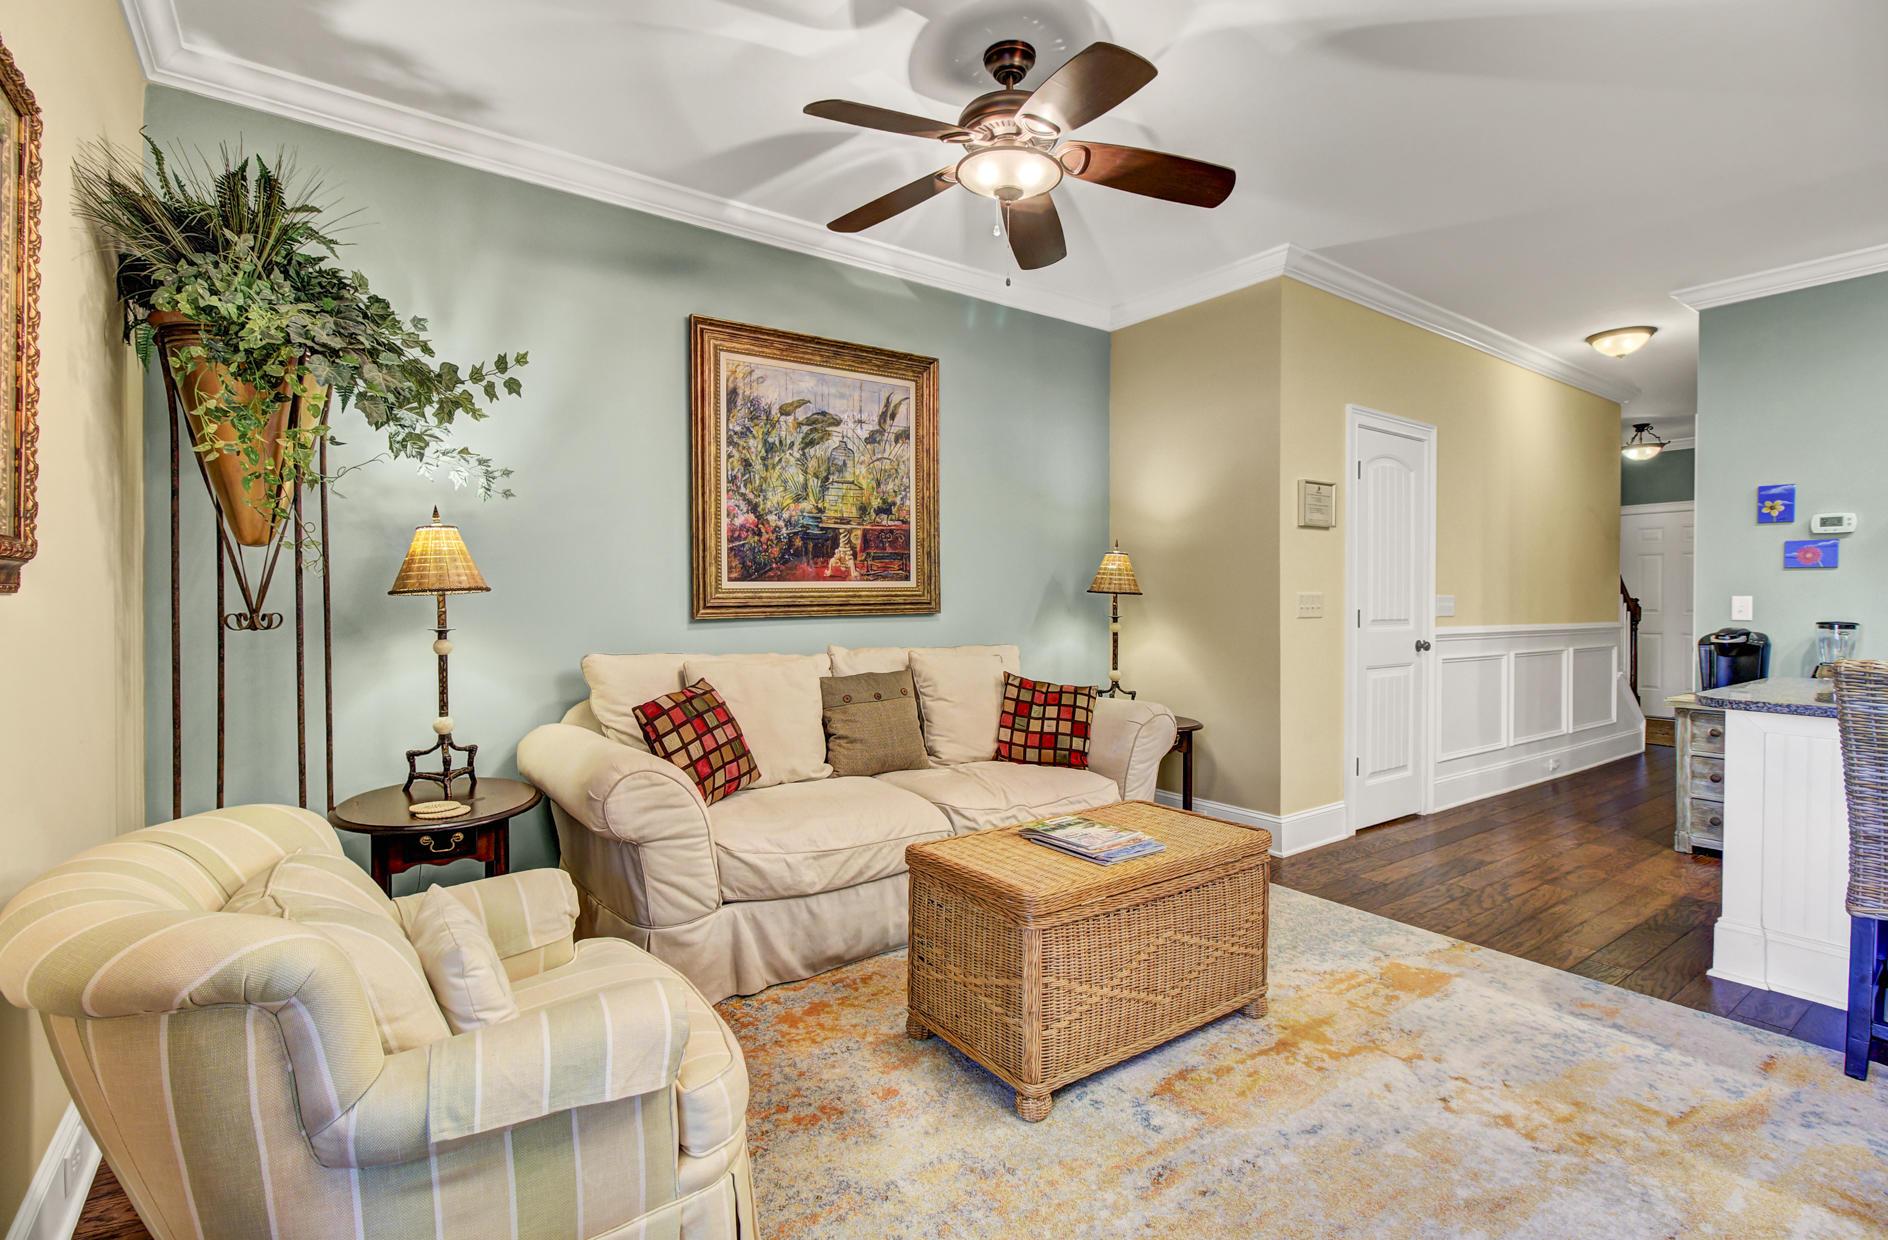 Carol Oaks Town Homes Homes For Sale - 2956 Emma, Mount Pleasant, SC - 22